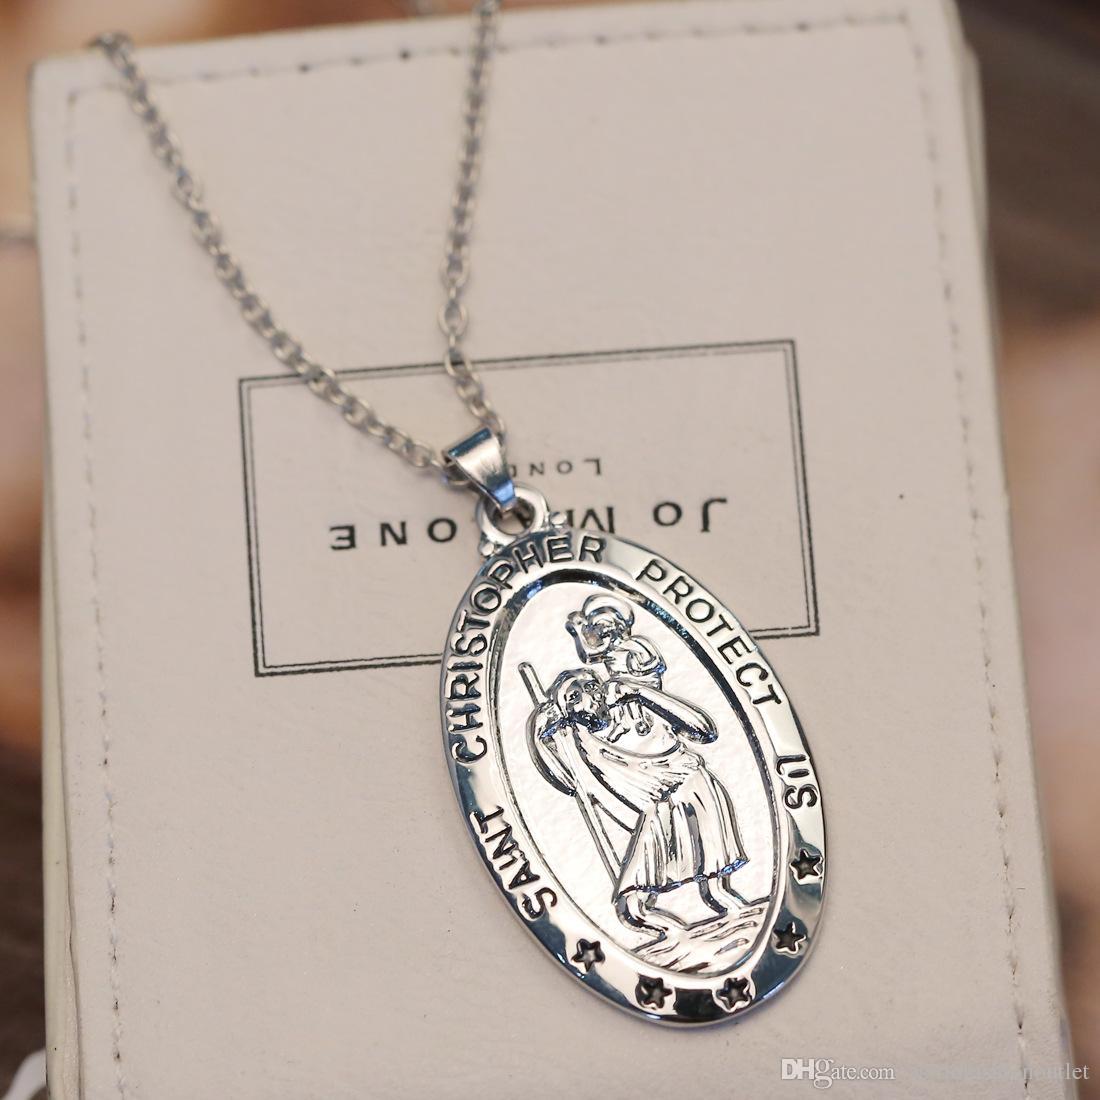 Fashion Jewelry Necklaces Pendants Charm Women Pendant Choker Chunky Statement Bib Chain Necklace St CHRISTOPHER Necklace Silver Saint Chain